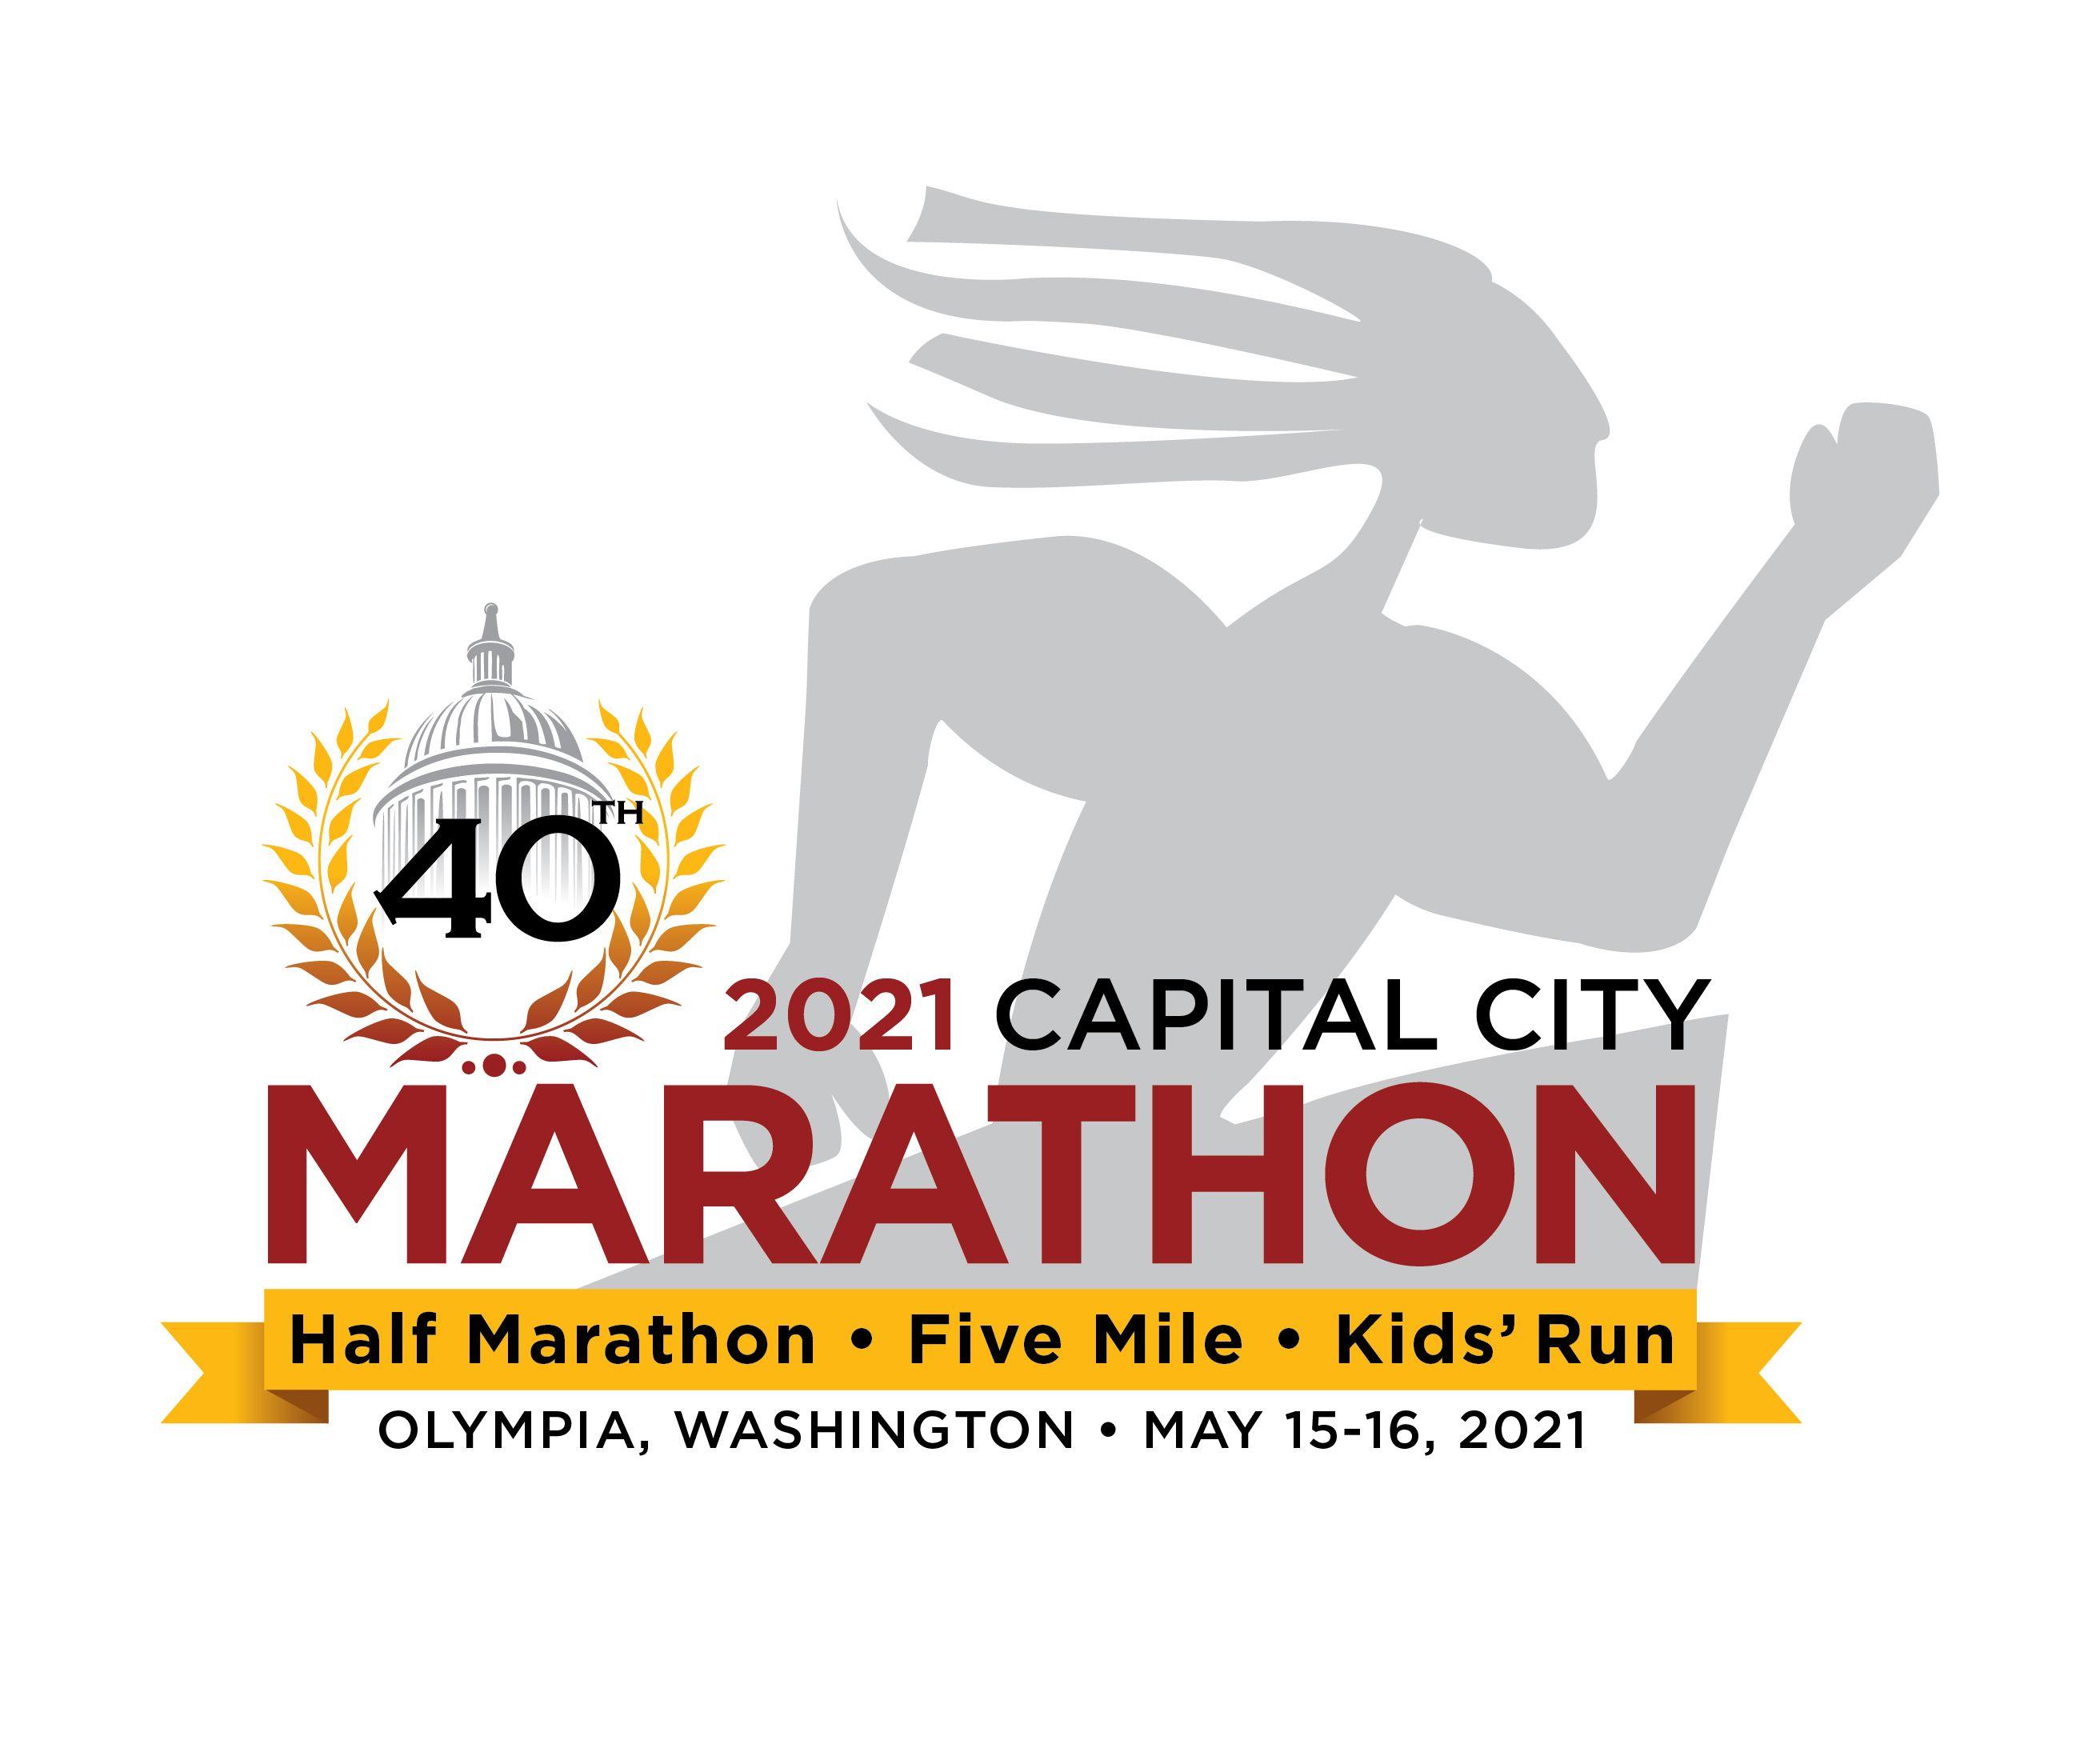 Capital City Marathon Association (Olympia, WA)